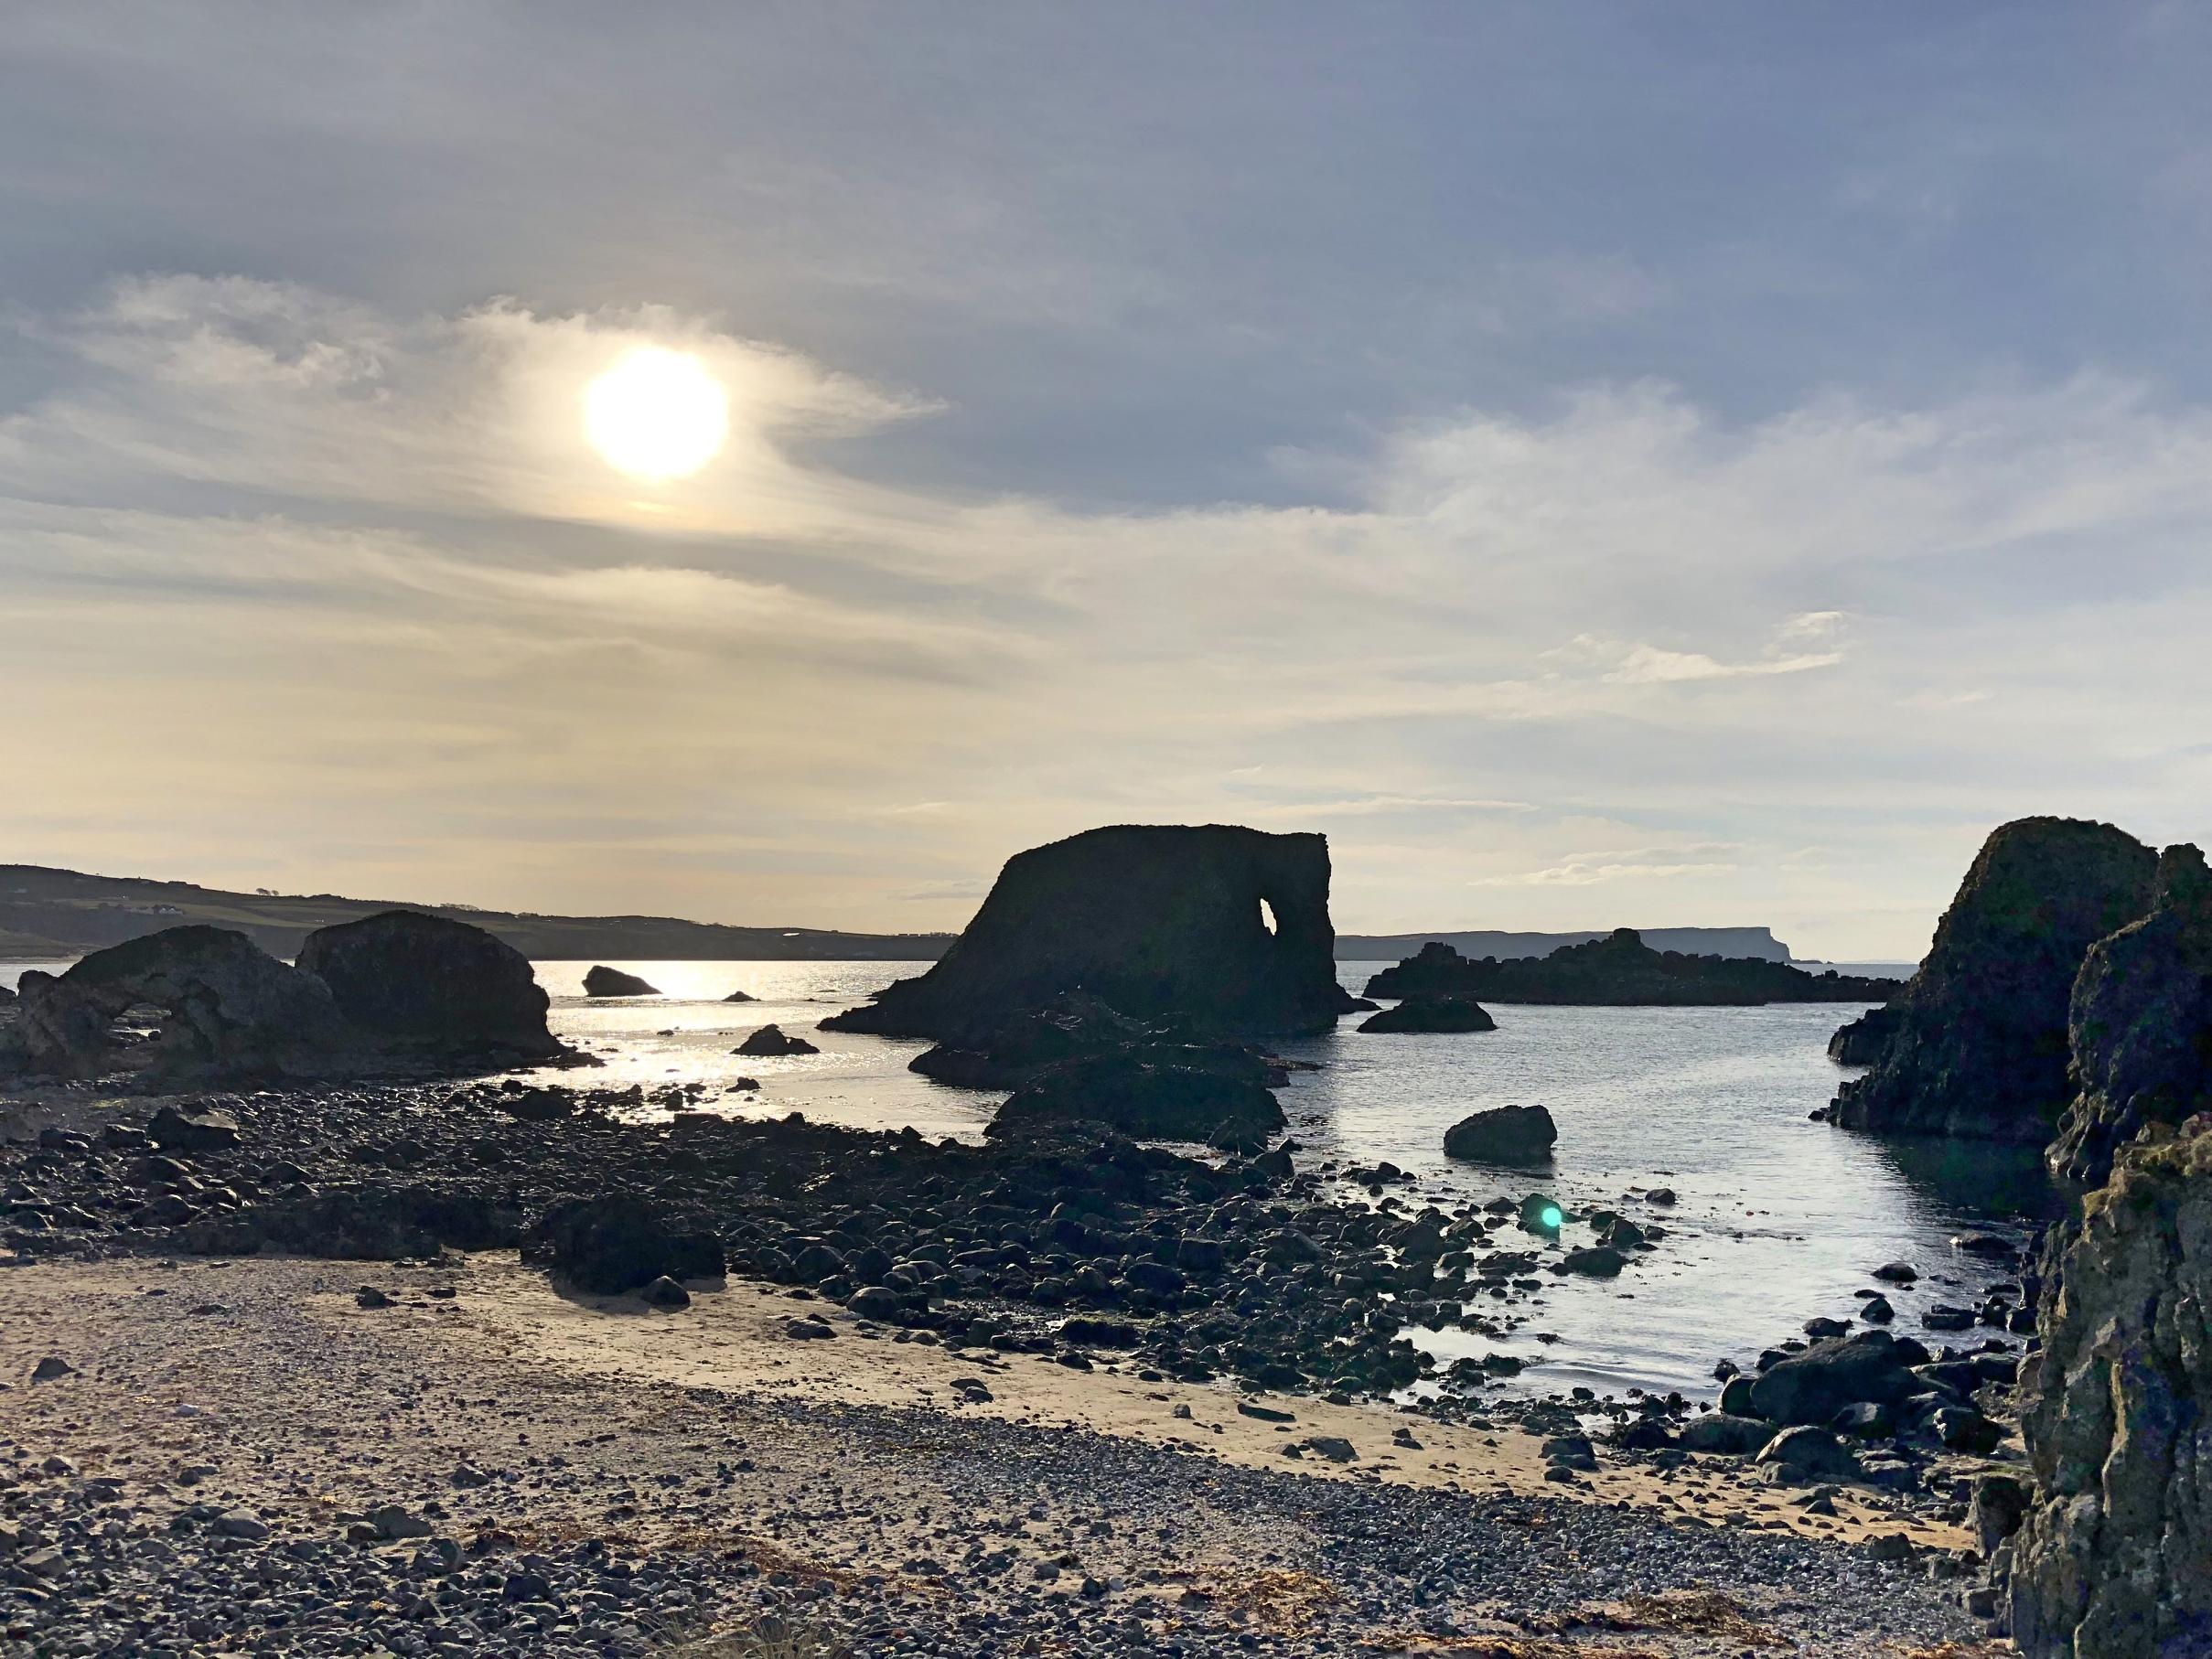 ballintoy_fullerton_arms_causeway_northern_ireland (10).jpg